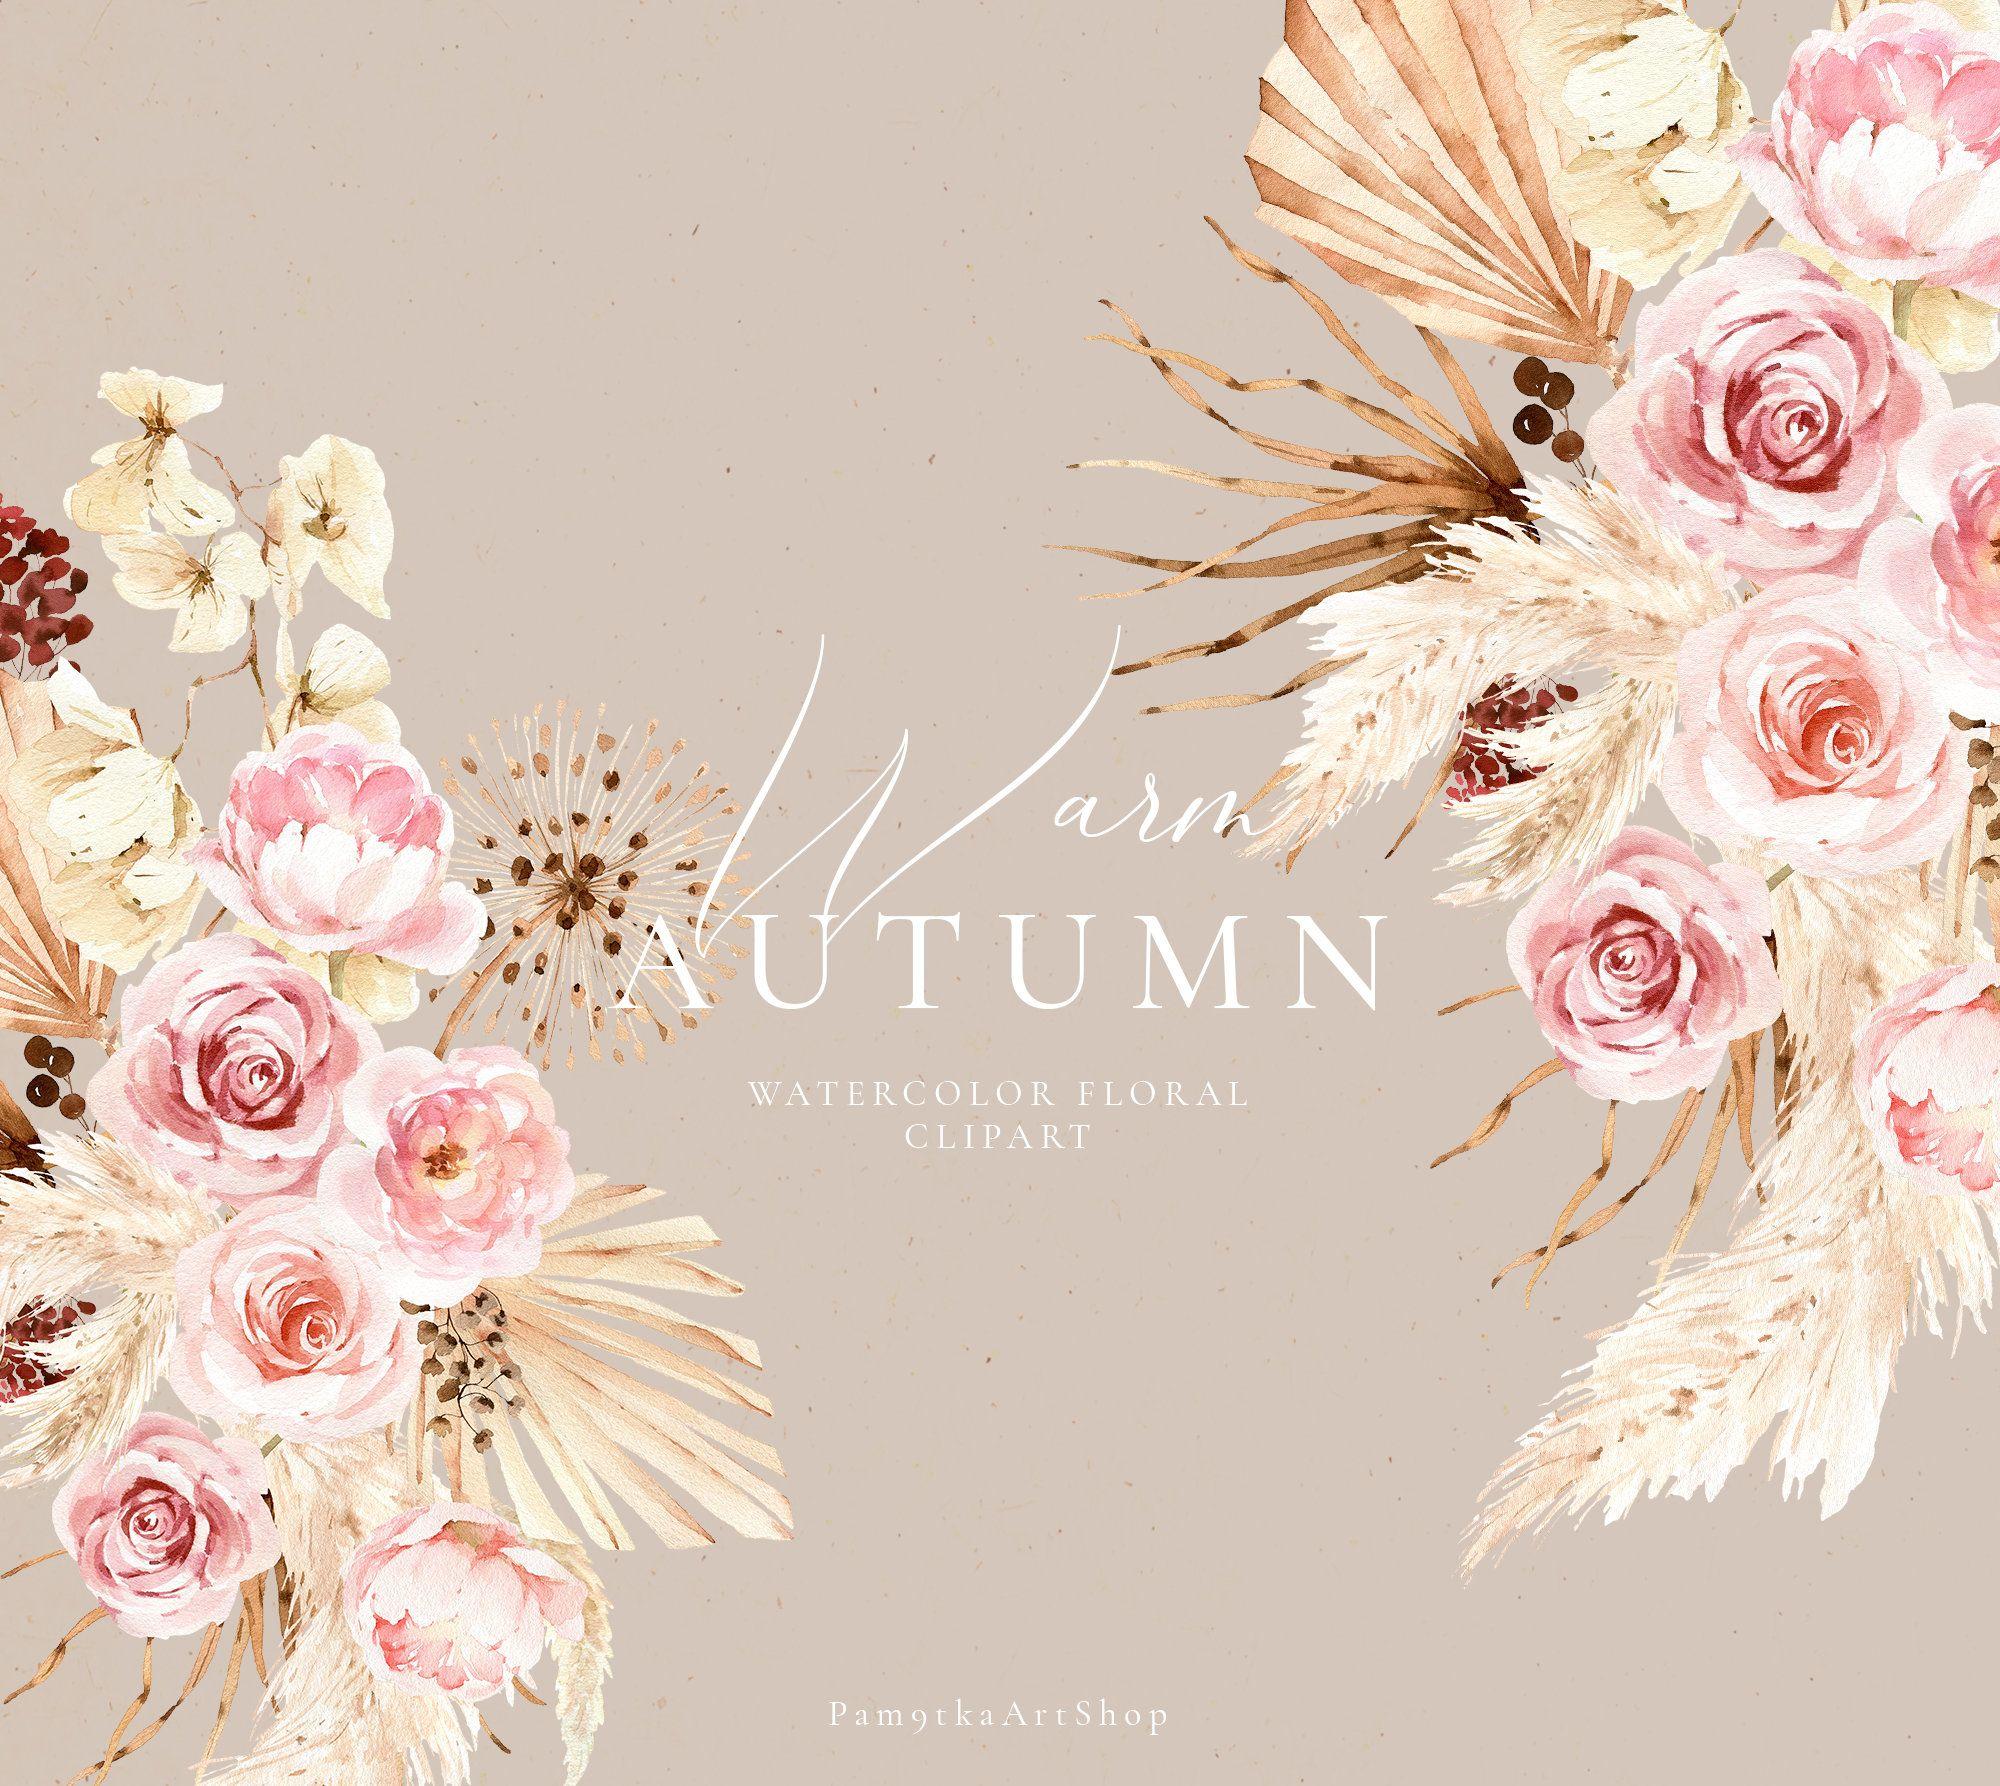 Autumn Watercolor Floral Clipart Elements Fall Flowers Fall Etsy Fall Watercolor Floral Watercolor Wedding Clipart